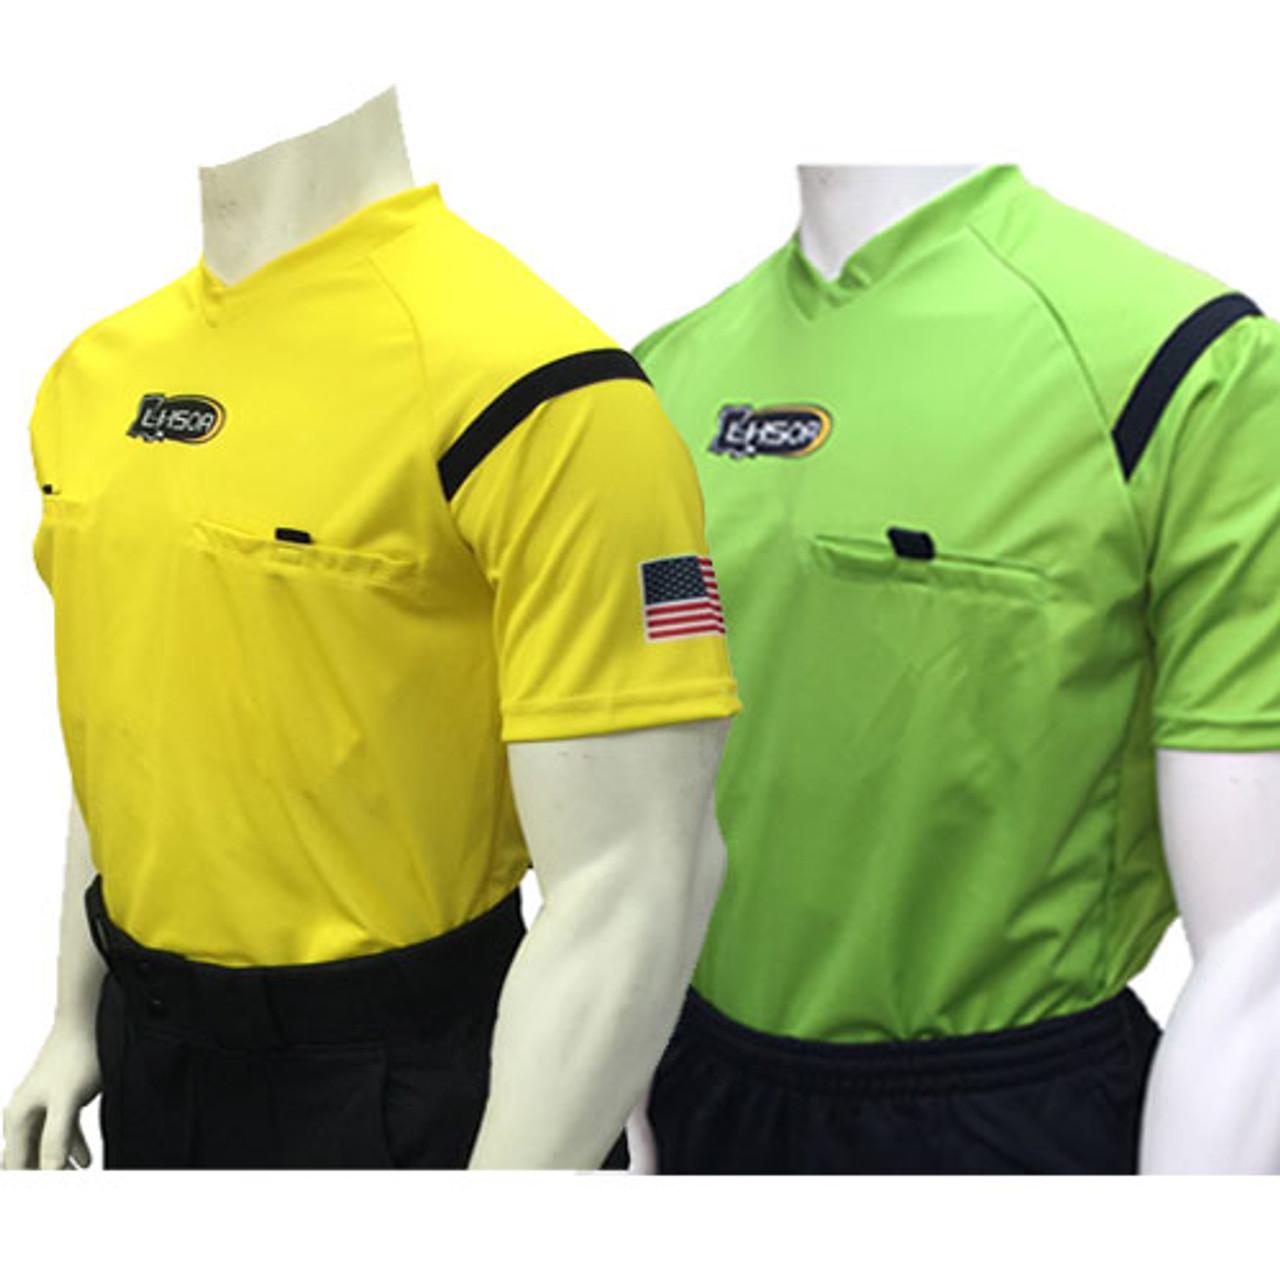 Louisiana LHSOA Dye-Sub Short Sleeve Soccer Shirt